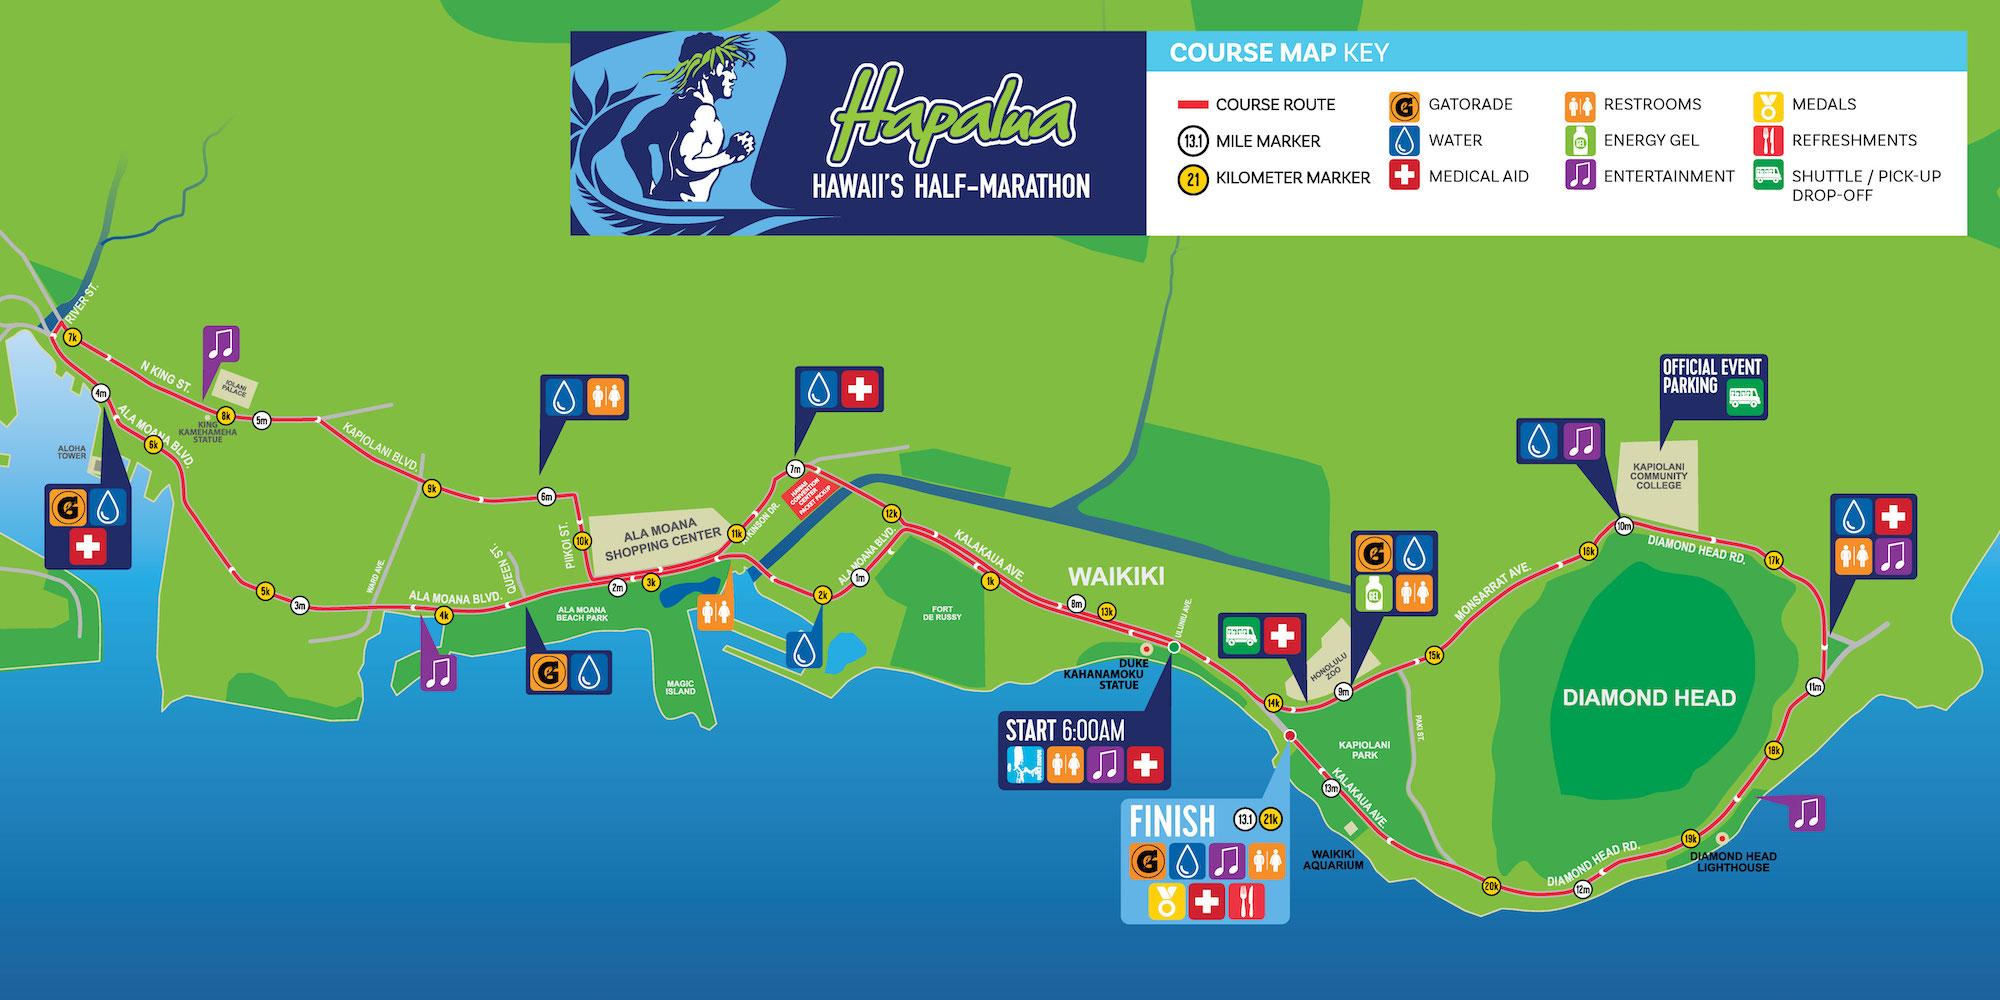 image about Printable Map of Waikiki identify Program Description - The Hapalua : The Hapalua